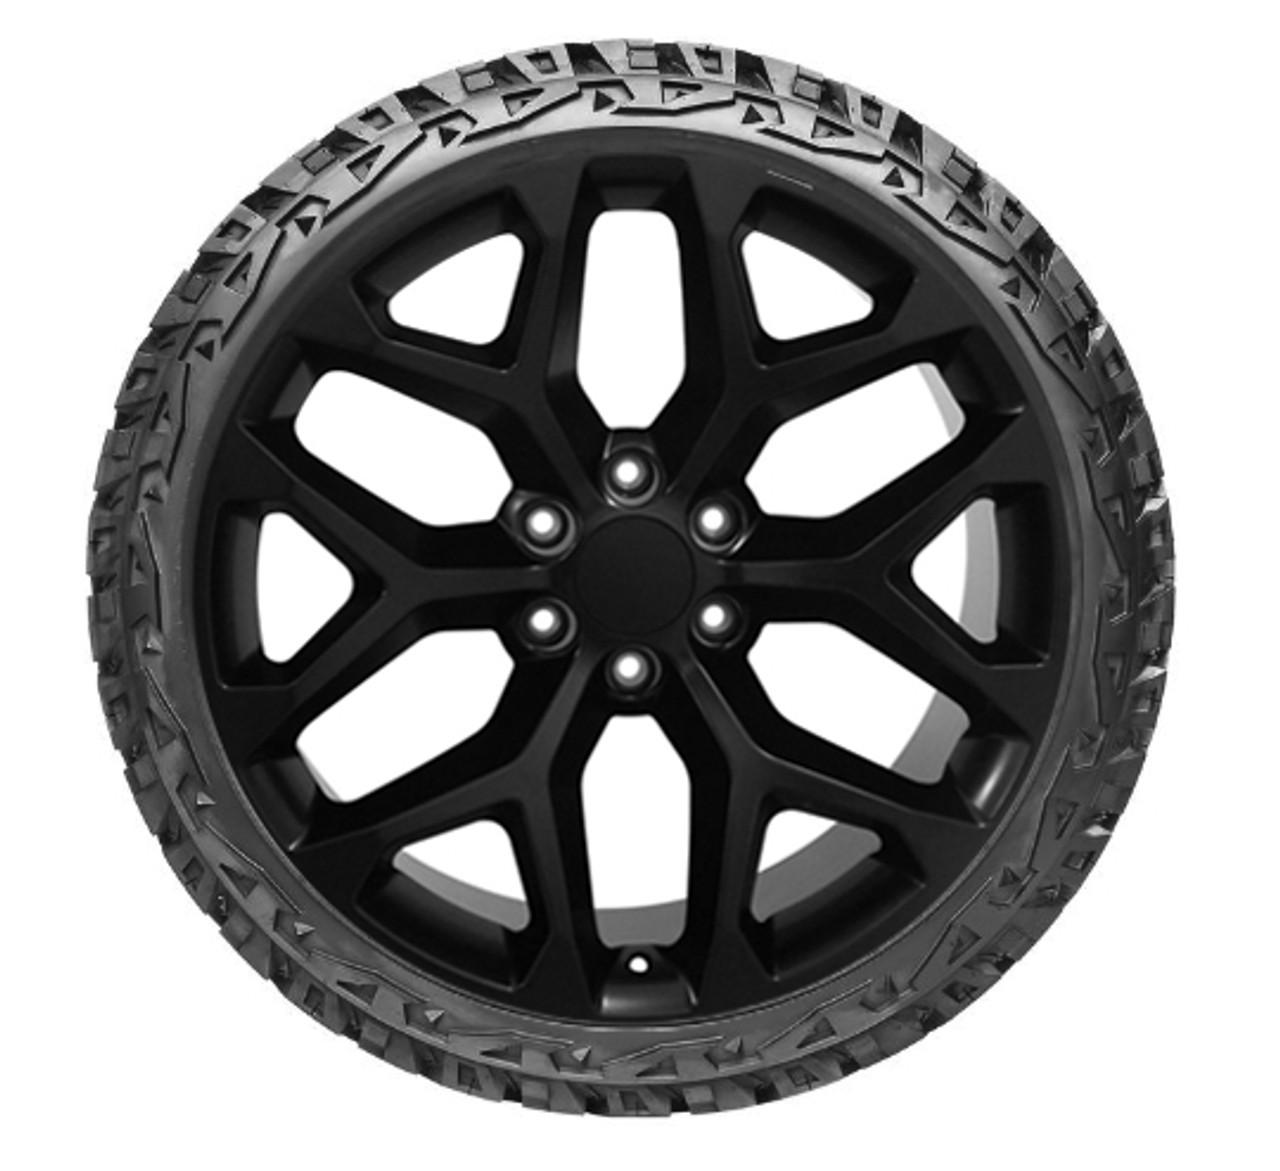 "Gloss Black 24"" Snowflake Wheels with Venom Terrain Hunter XT Tires for Chevy and GMC Trucks and SUVs"